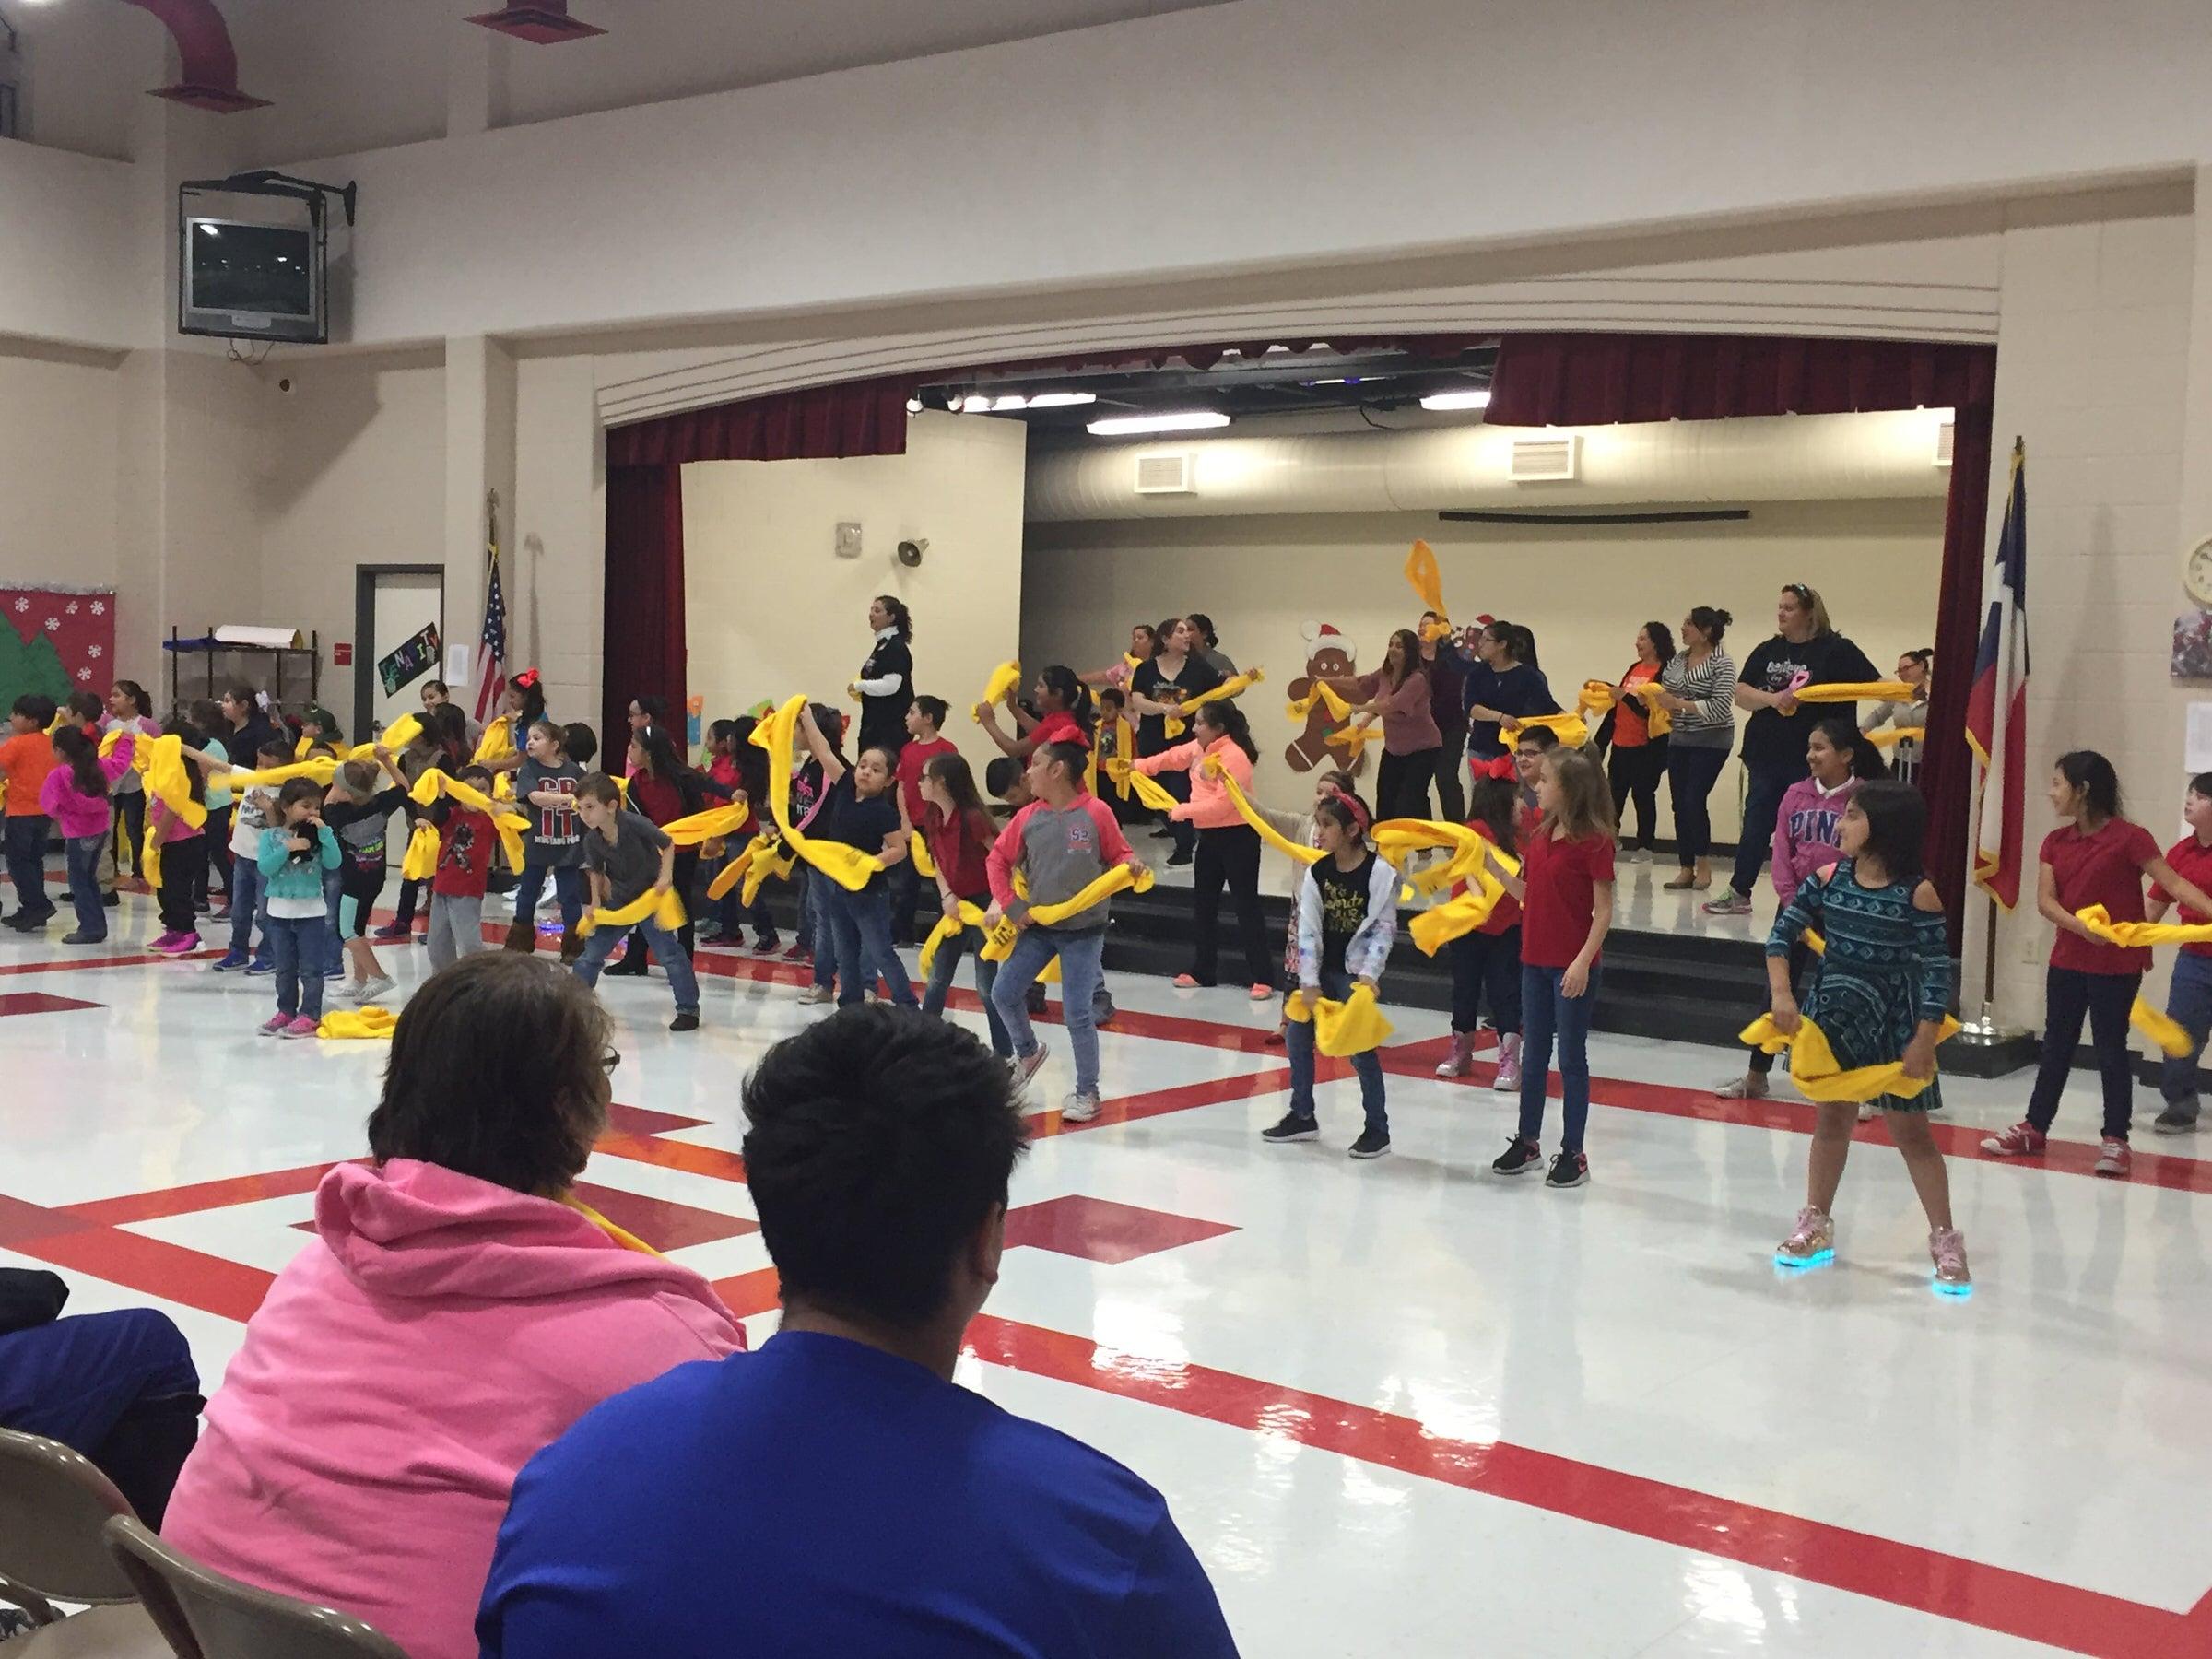 NSCW dance assembly - Noonan Elementary School, Alice, TX